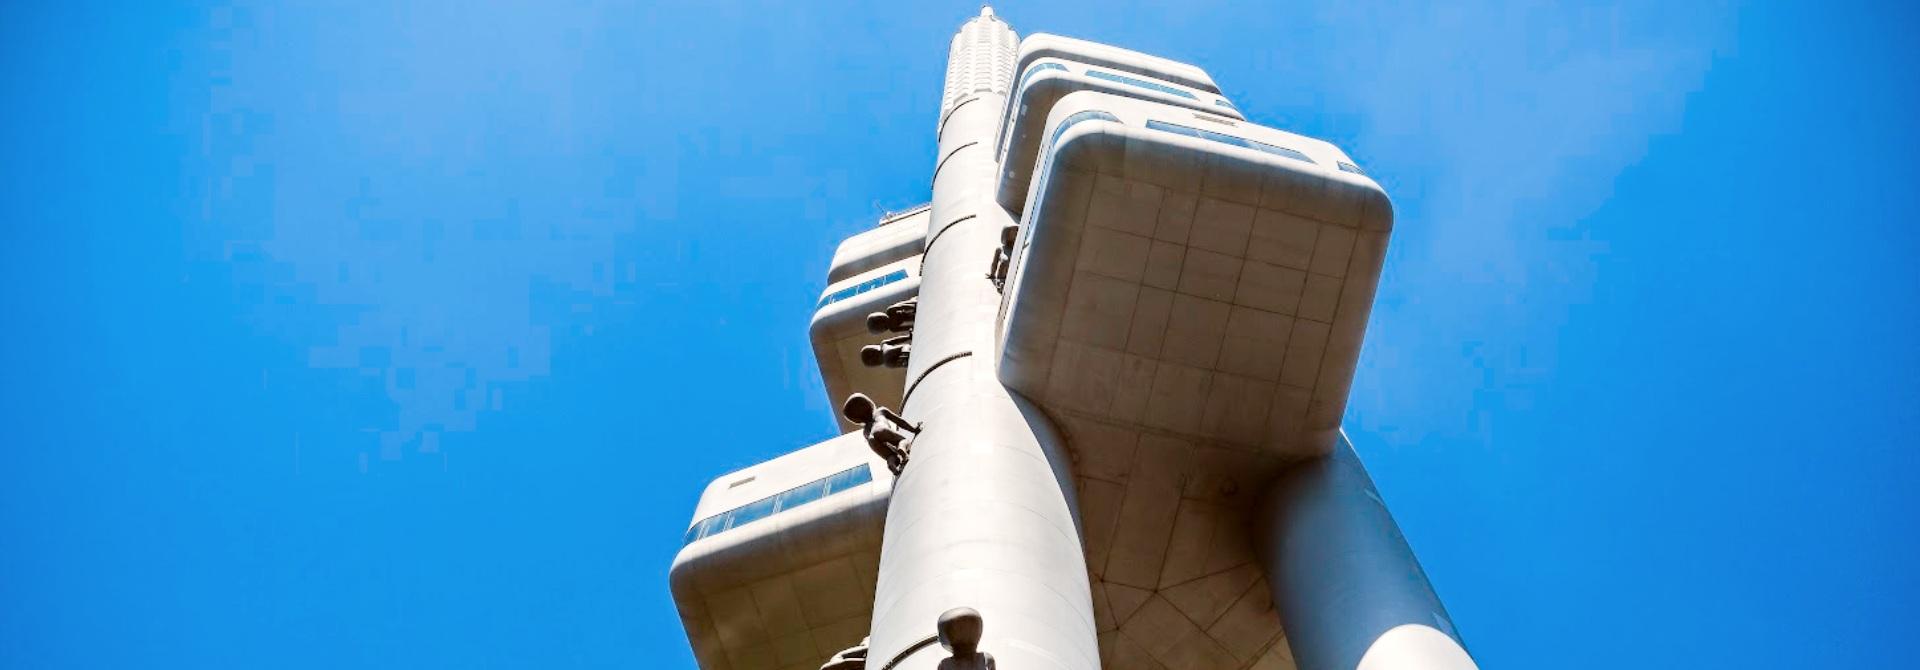 Prague TV Tower Header